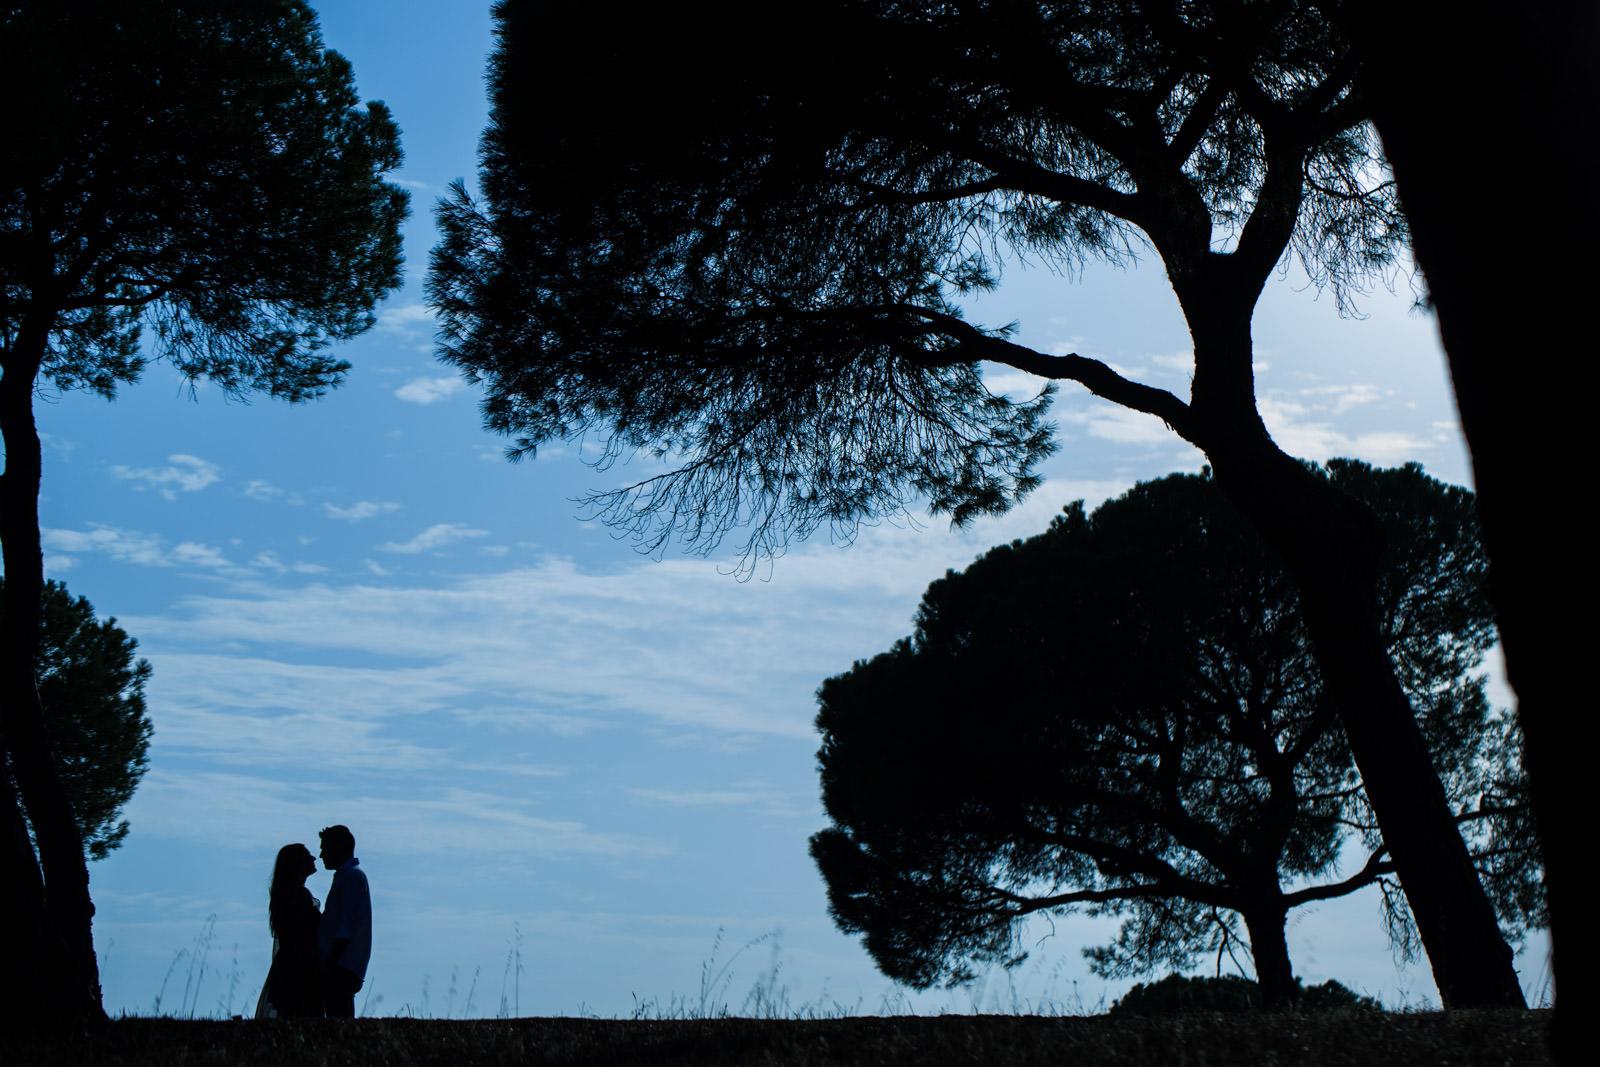 Boda-Sevilla-Parador-Carmona-bridal-engagement-Rafael-Torres-fotografo-bodas-sevilla-madrid-barcelona-wedding-photographer--3.jpg